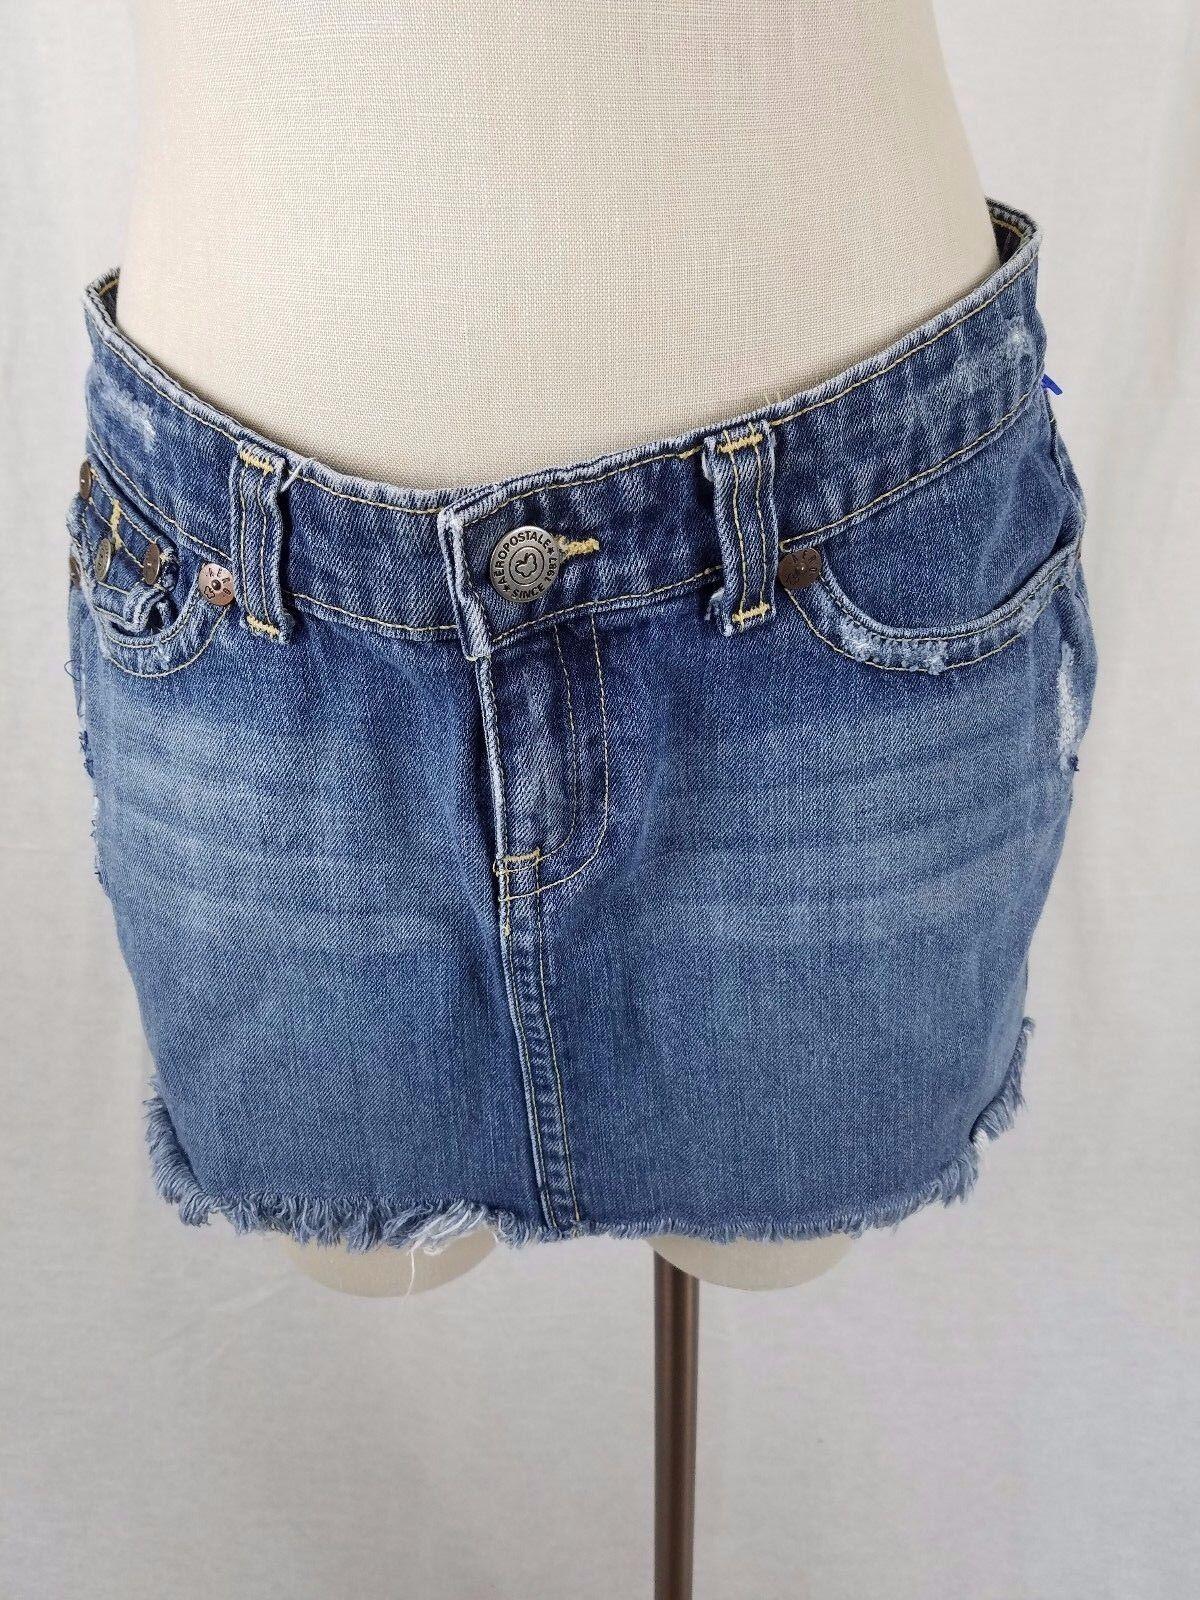 Aeropostale Distressed Destroyed Denim bluee Jean Mini Skirt Womens Juniors 9 10